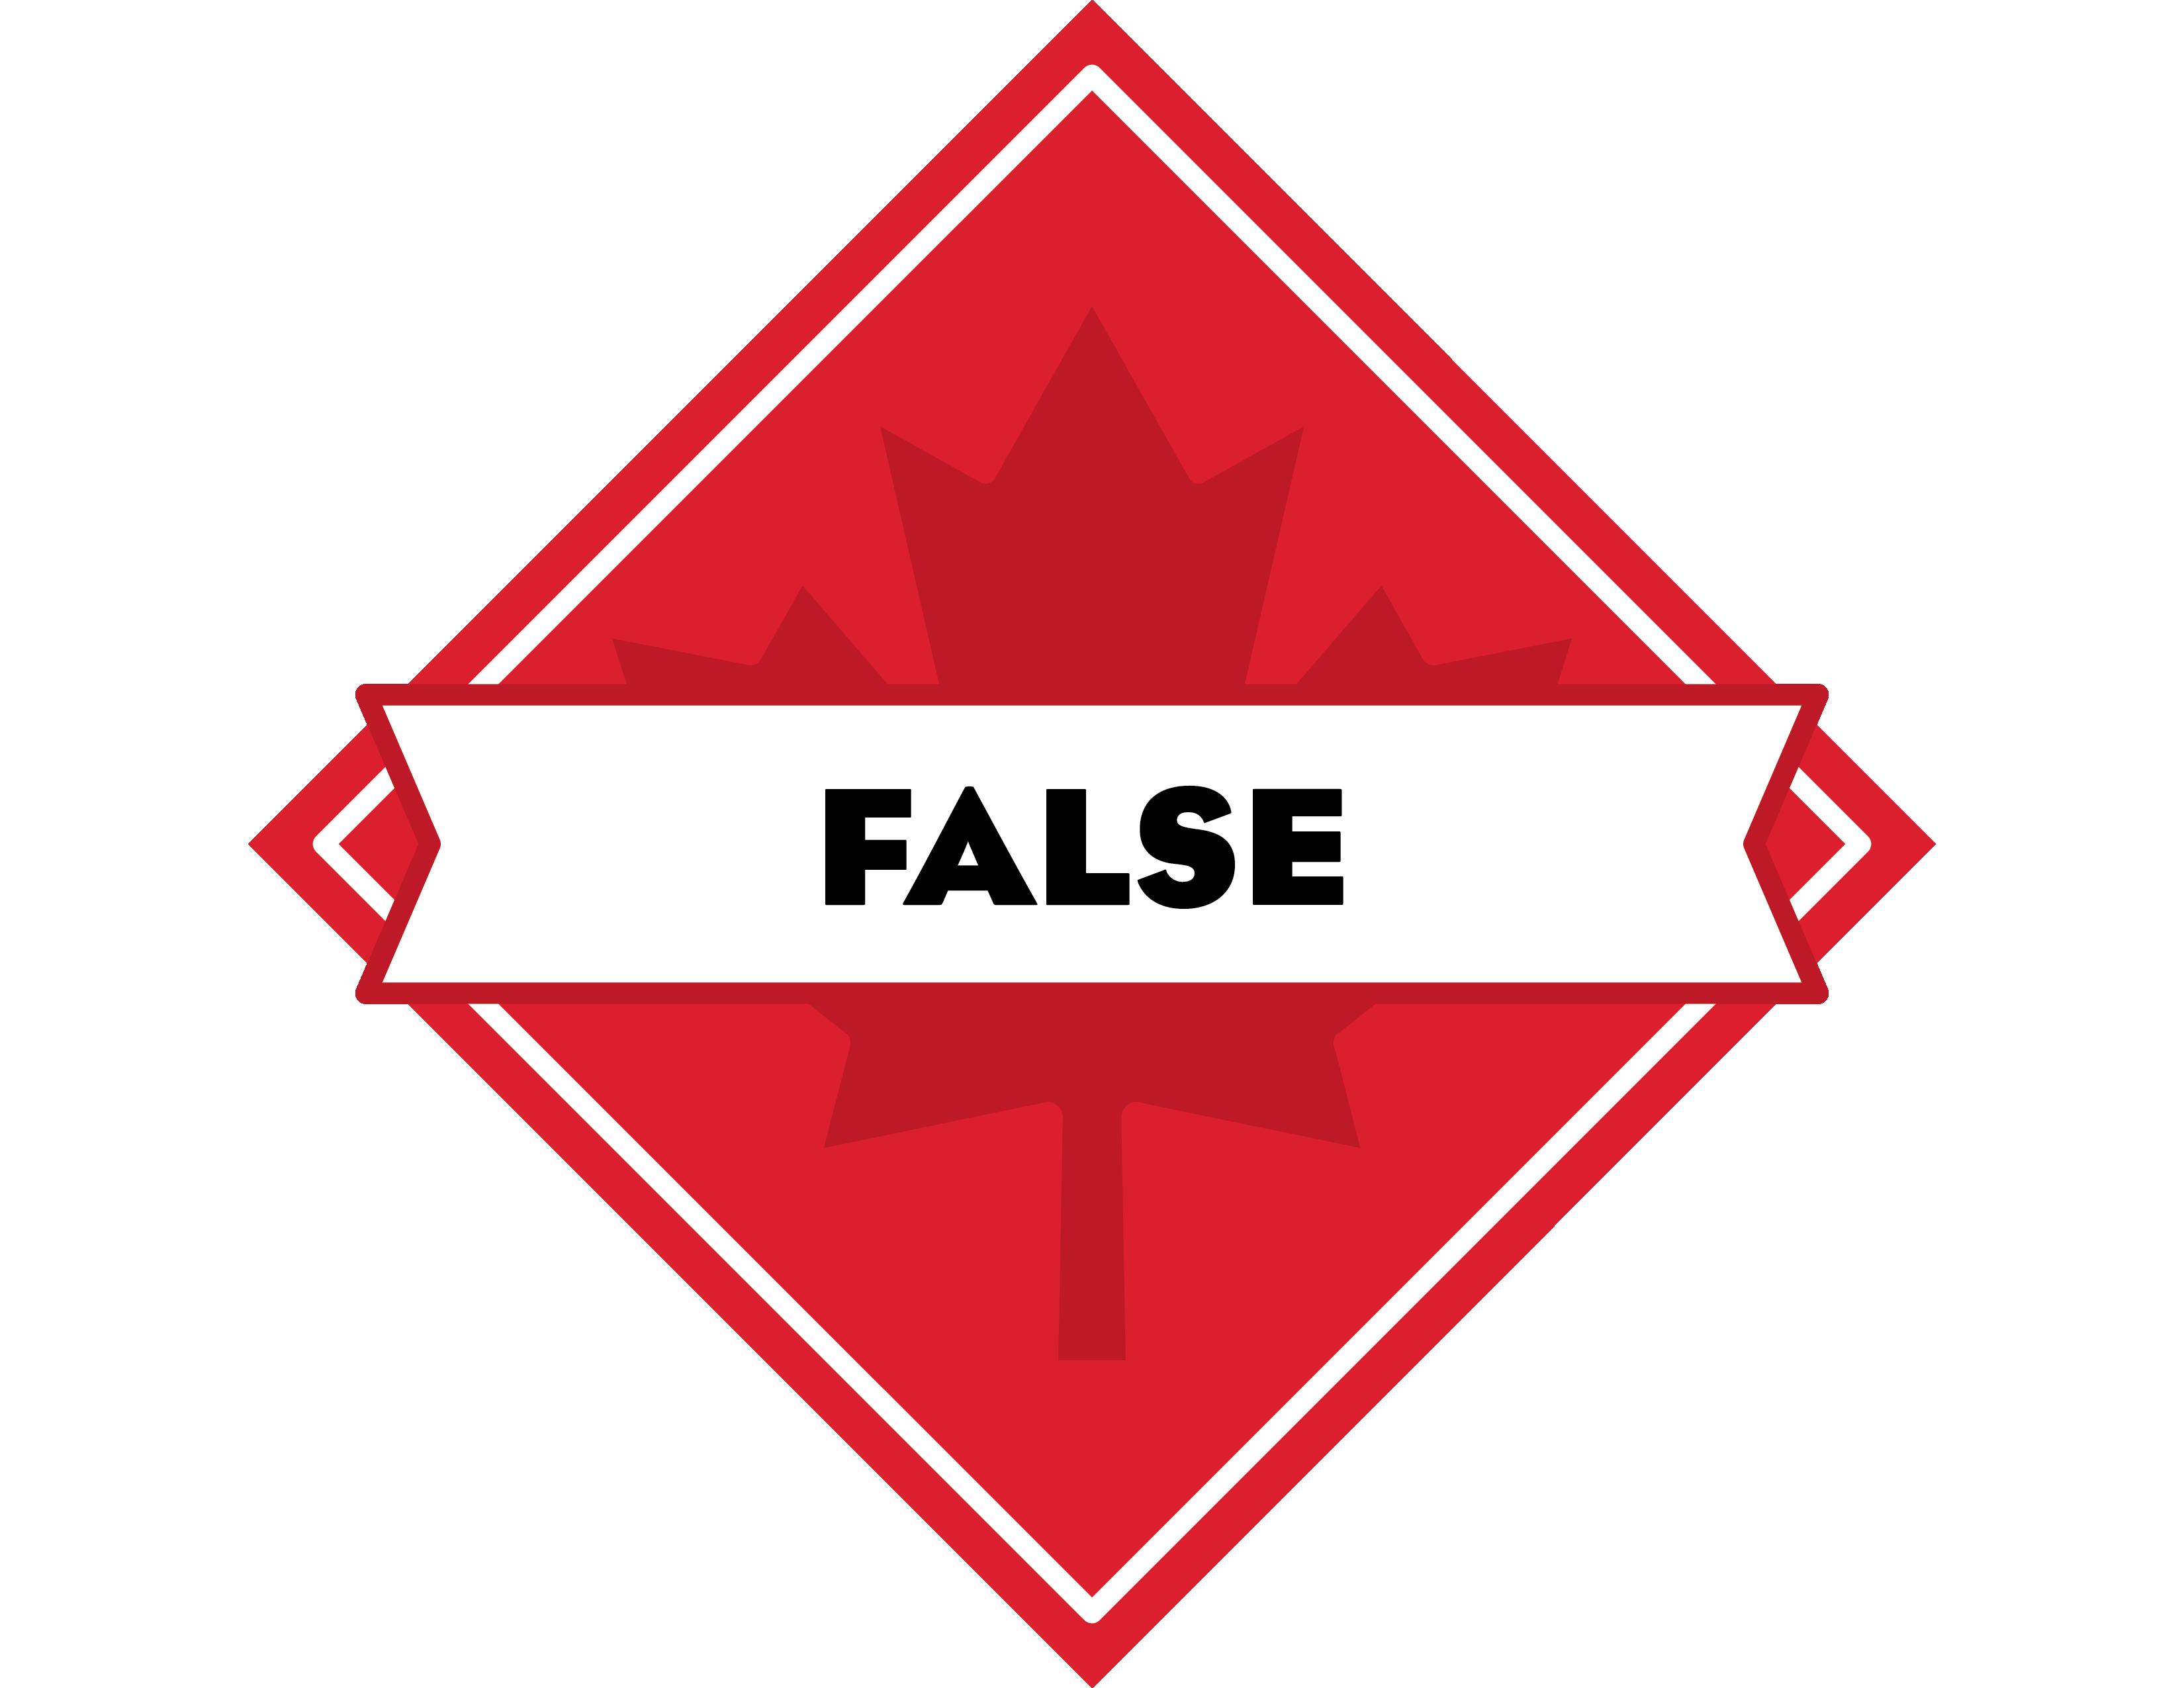 Factscan Conservative Party Omar Khadr Didnt Apologize